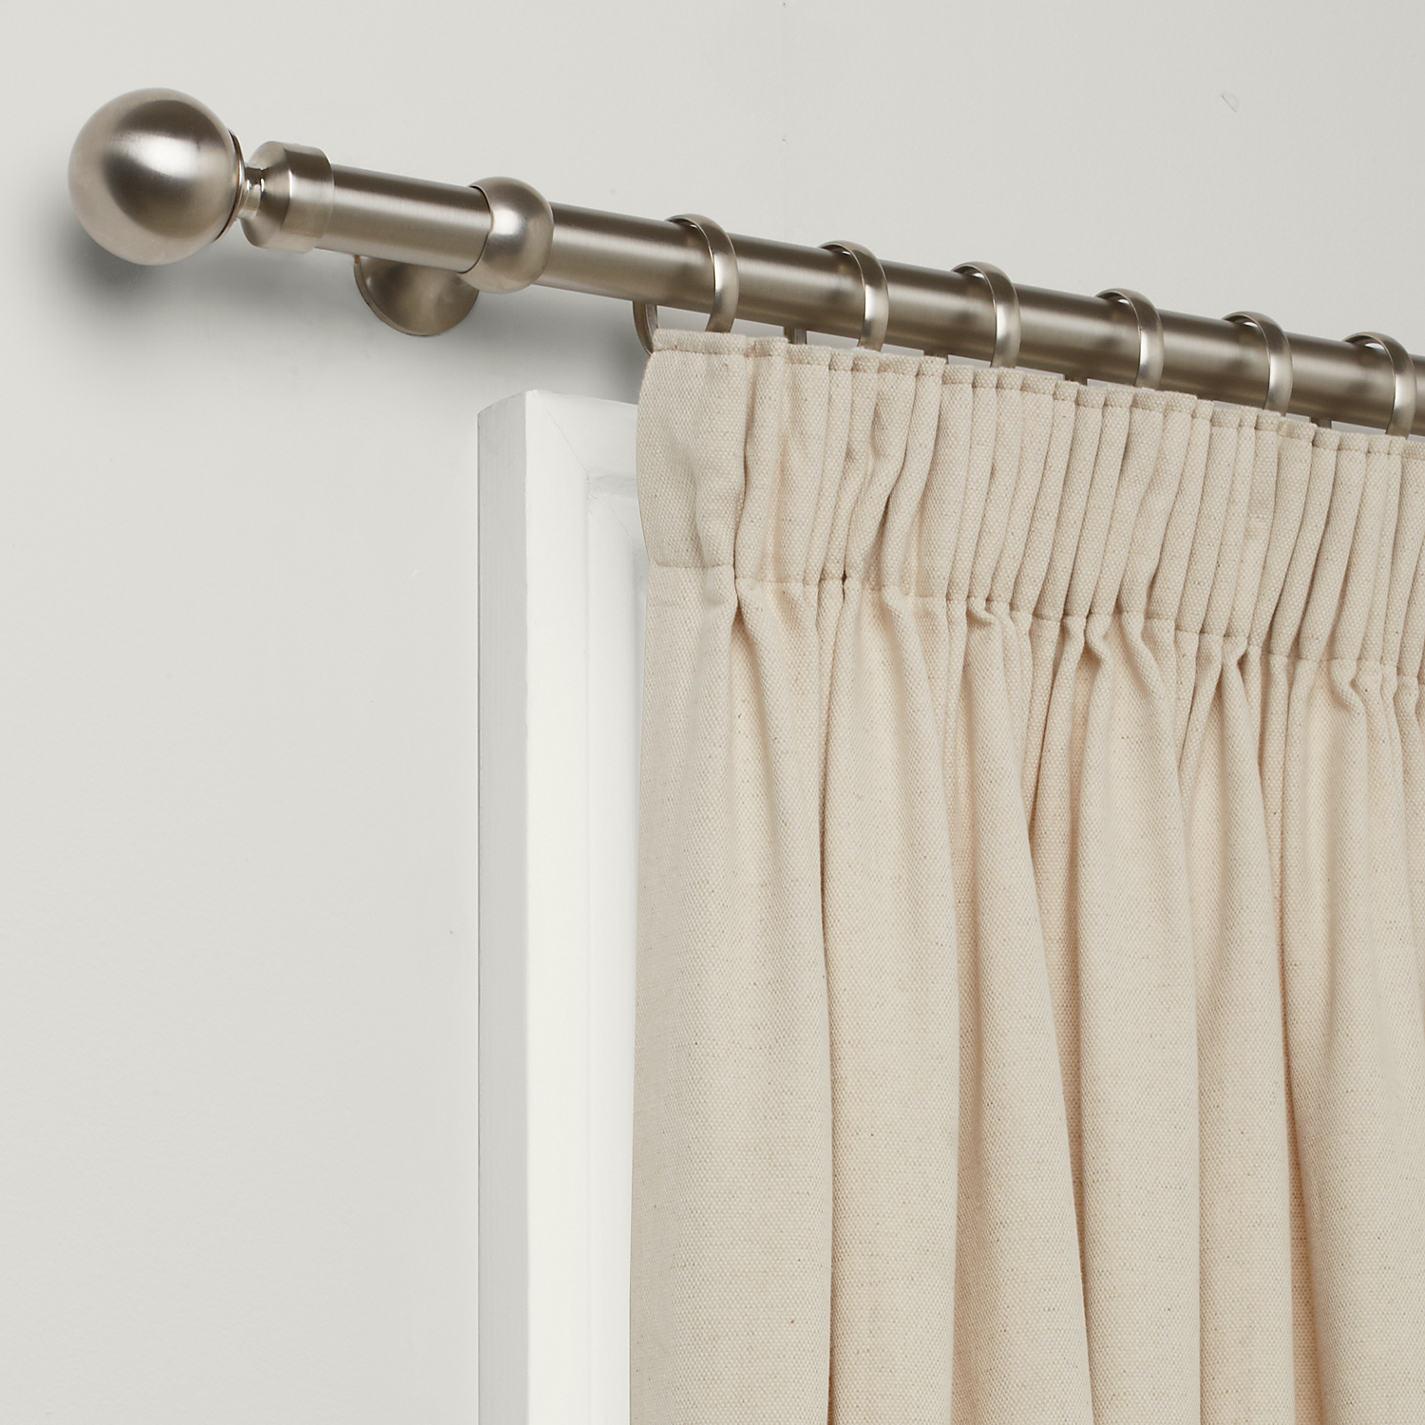 2m steel curtain pole curtain menzilperdenet